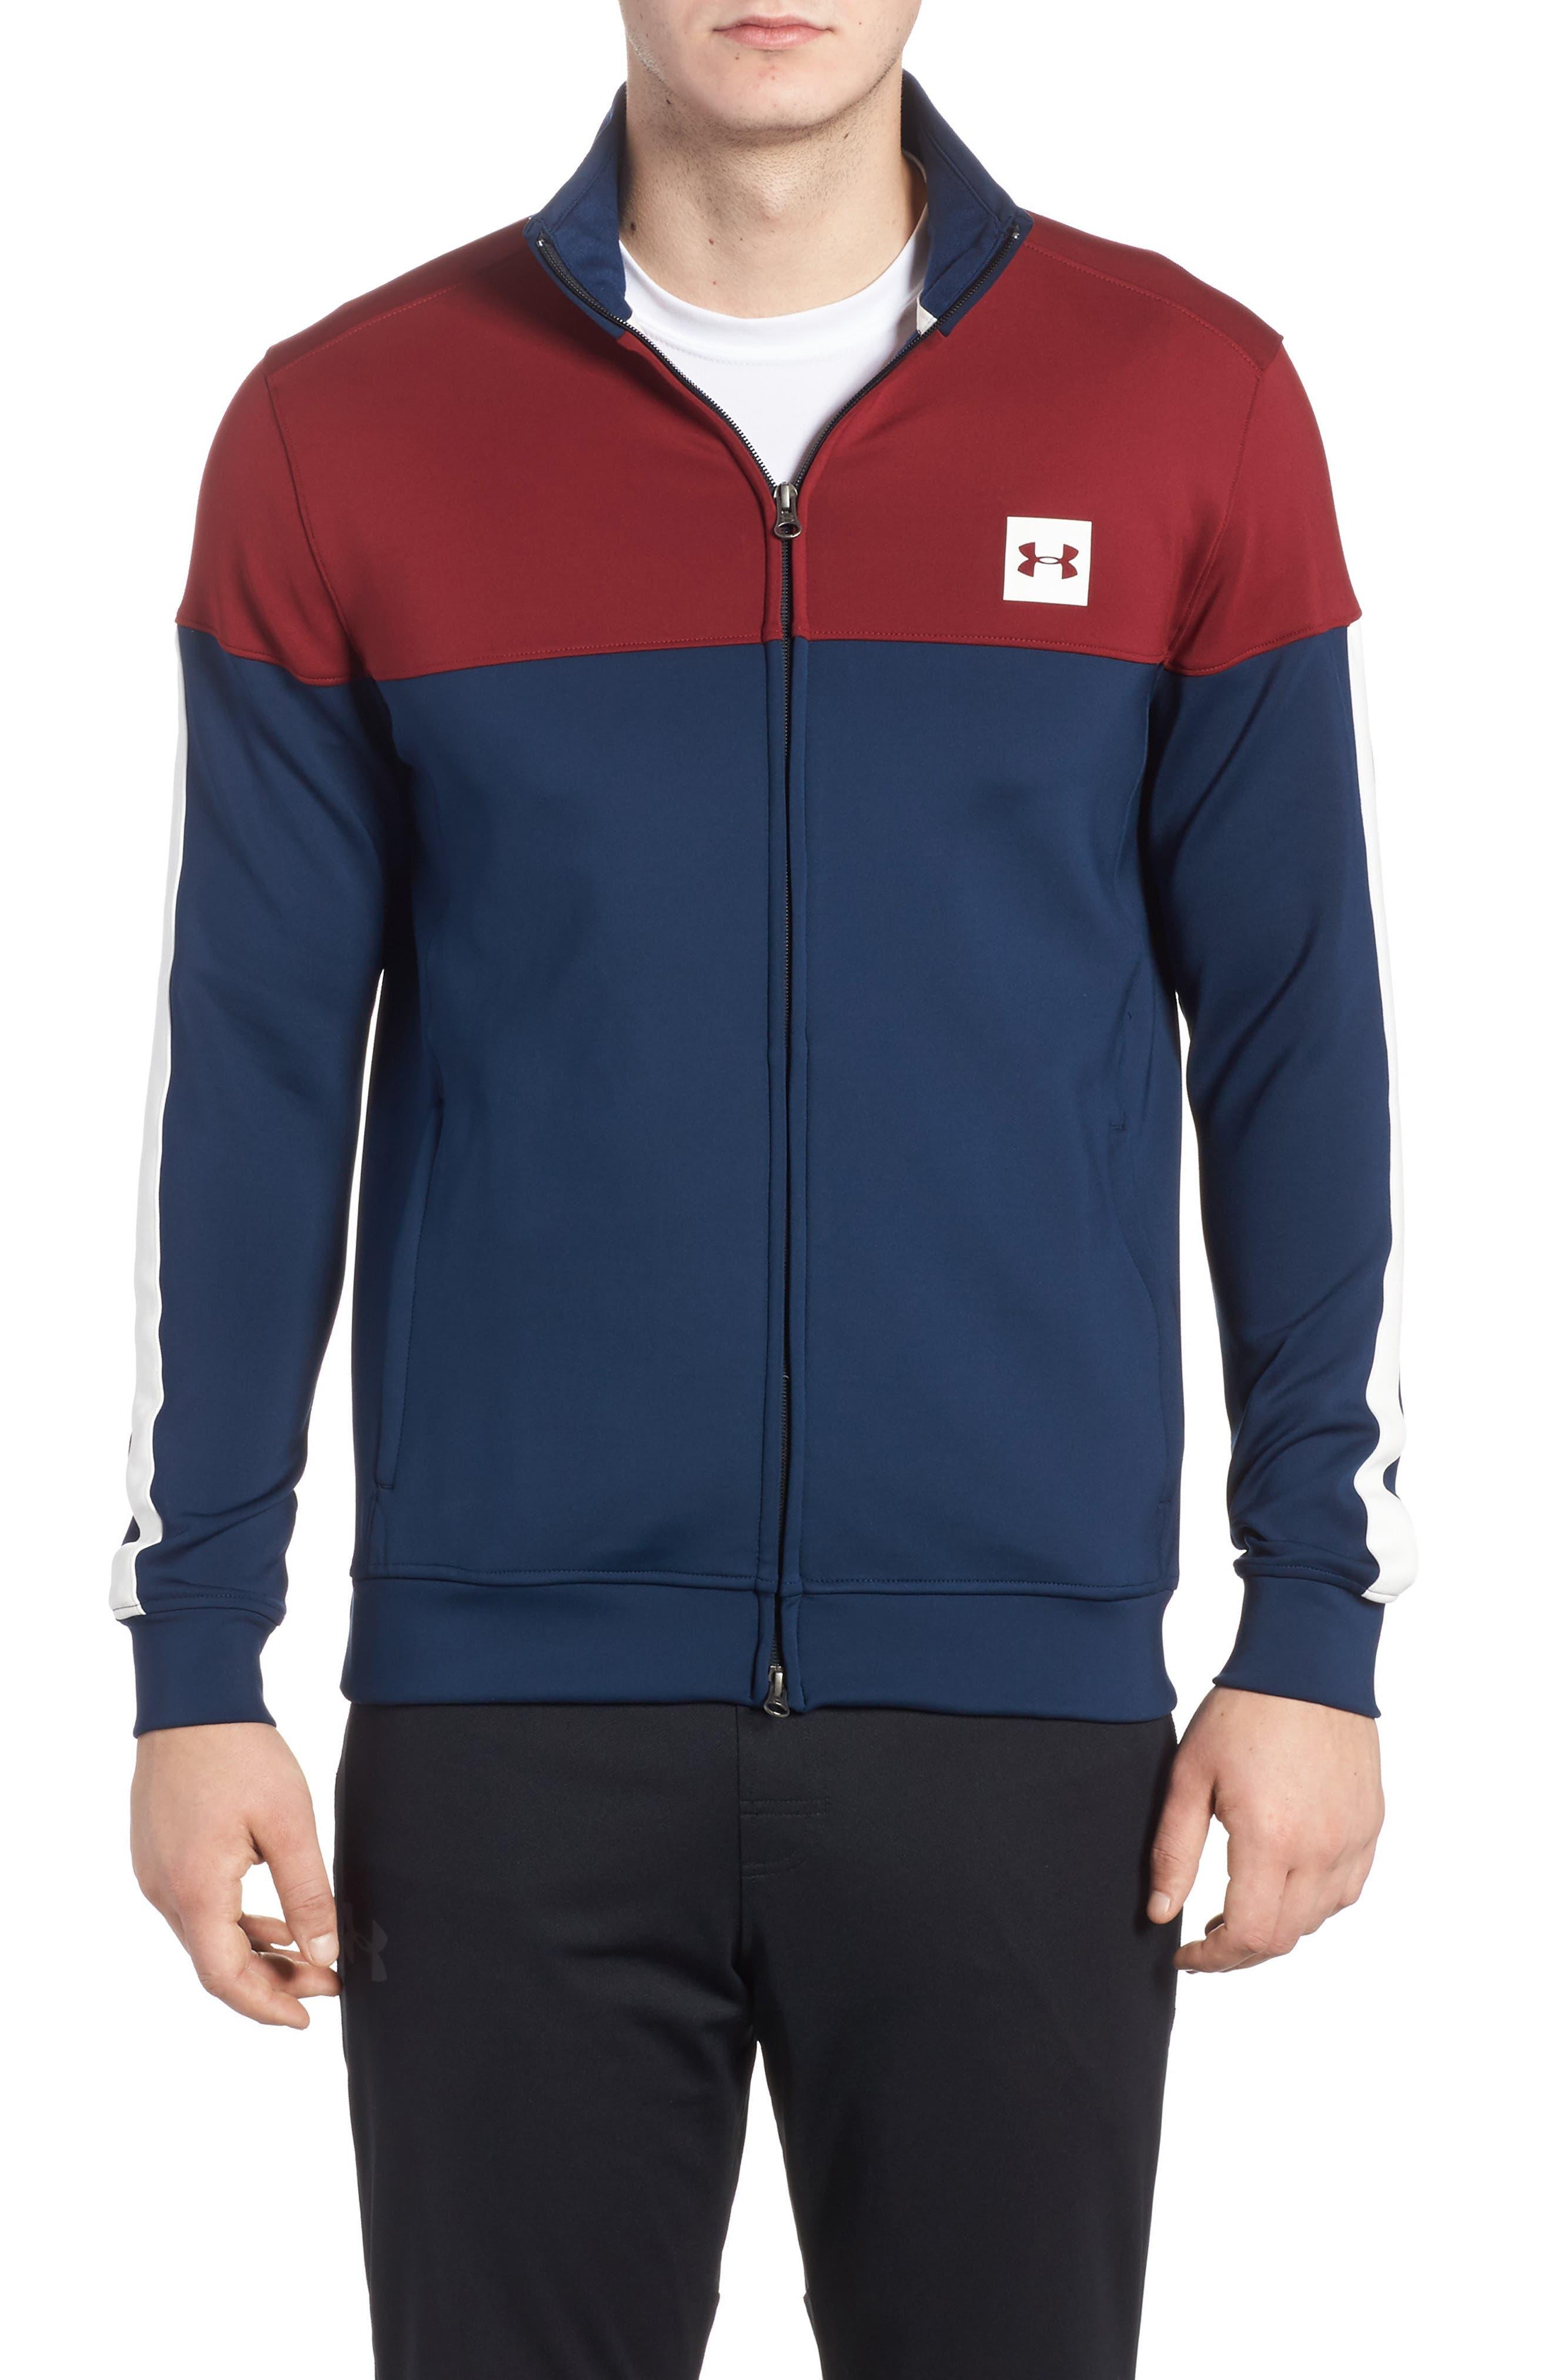 Main Image - Under Armour Sportstyle Track Jacket